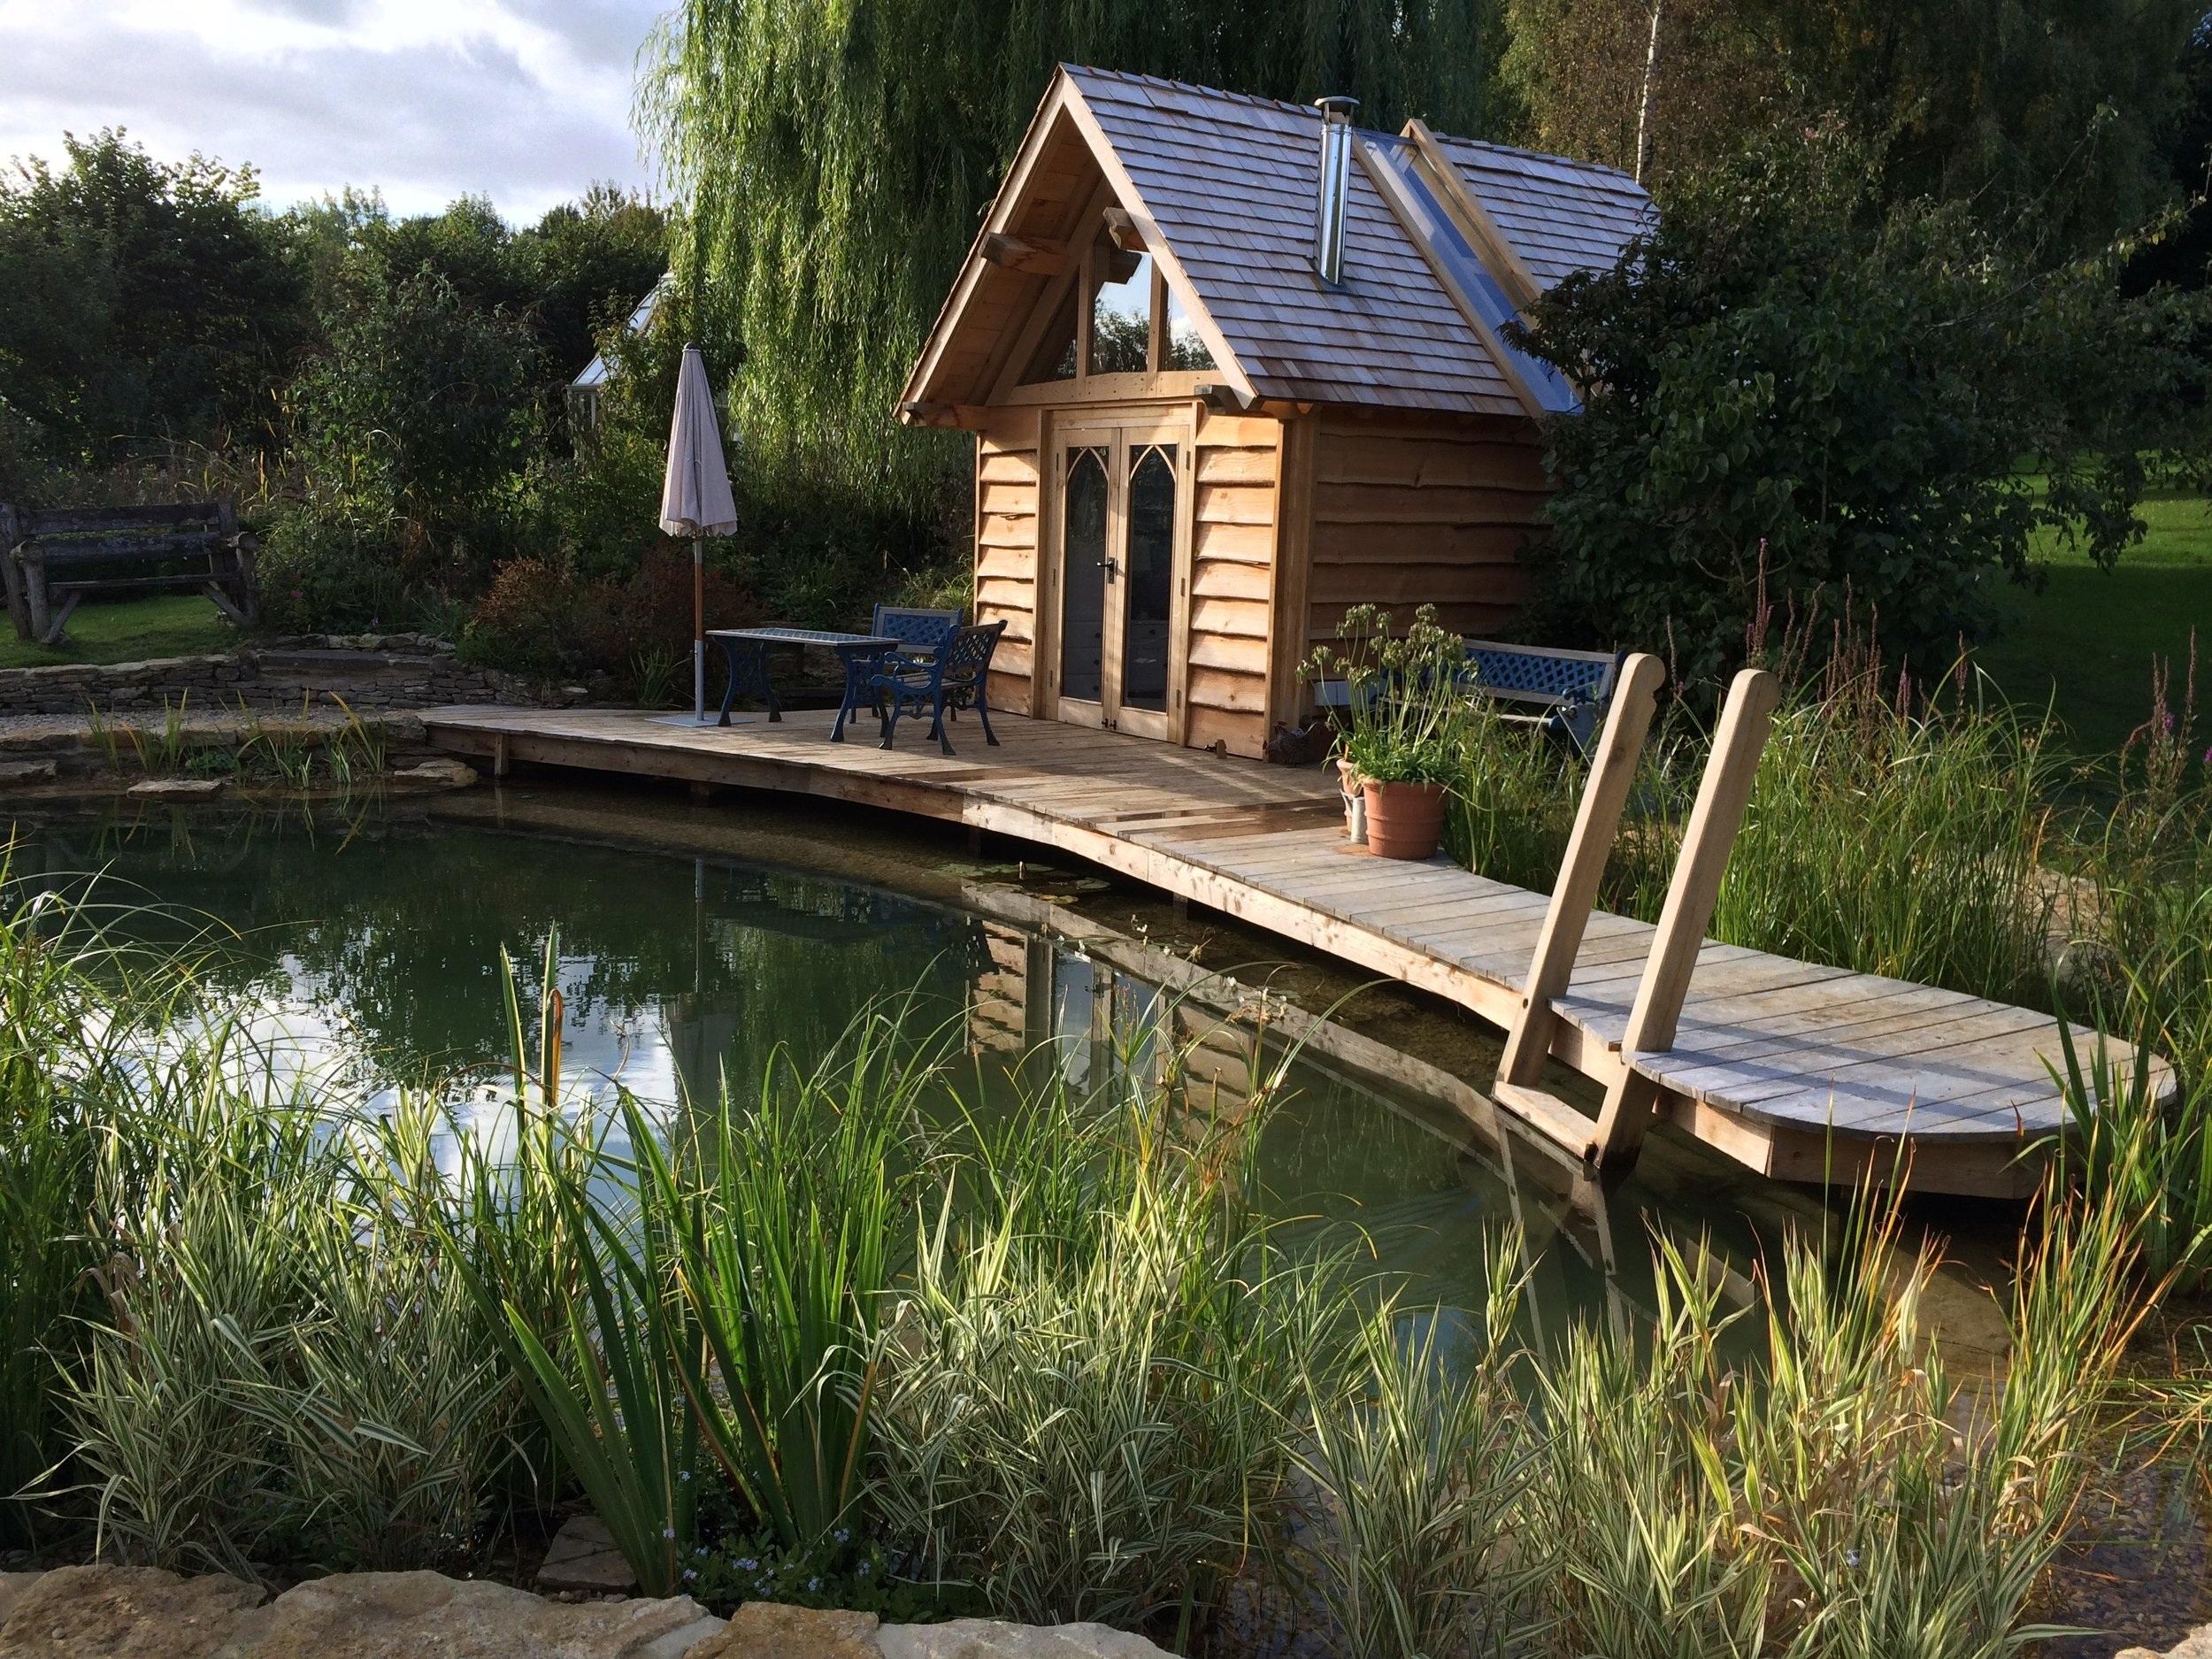 SHELTER - Cabins & LodgesGarden RoomsPergola Structures